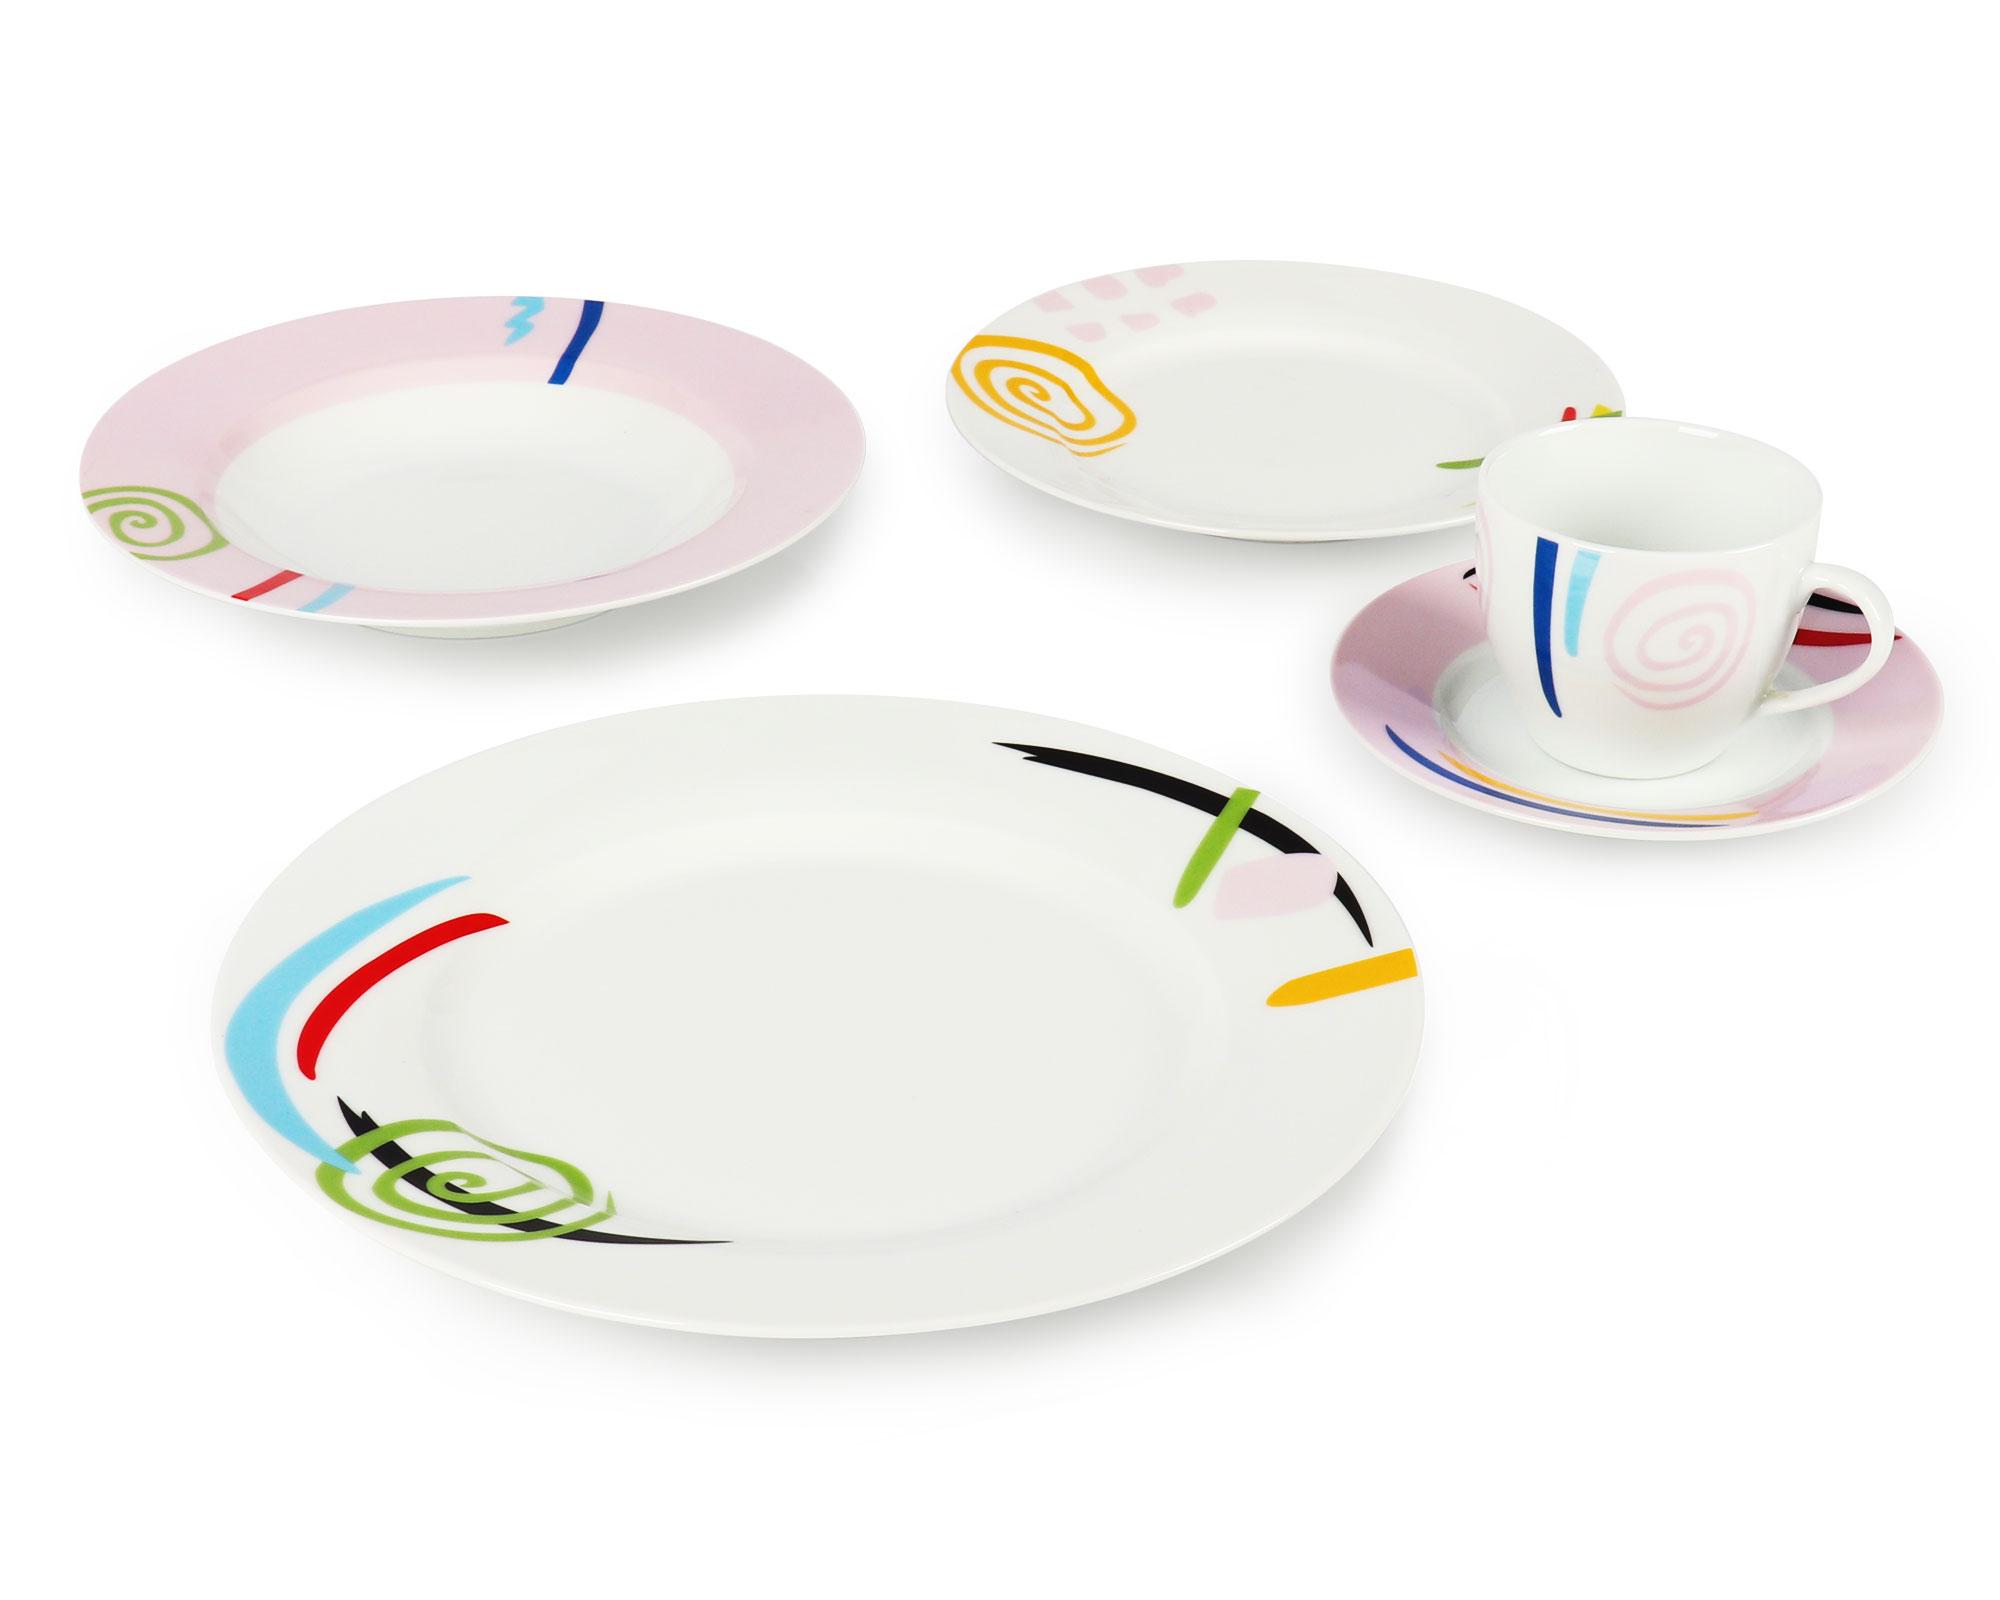 Round shape porcelain dinnerware set